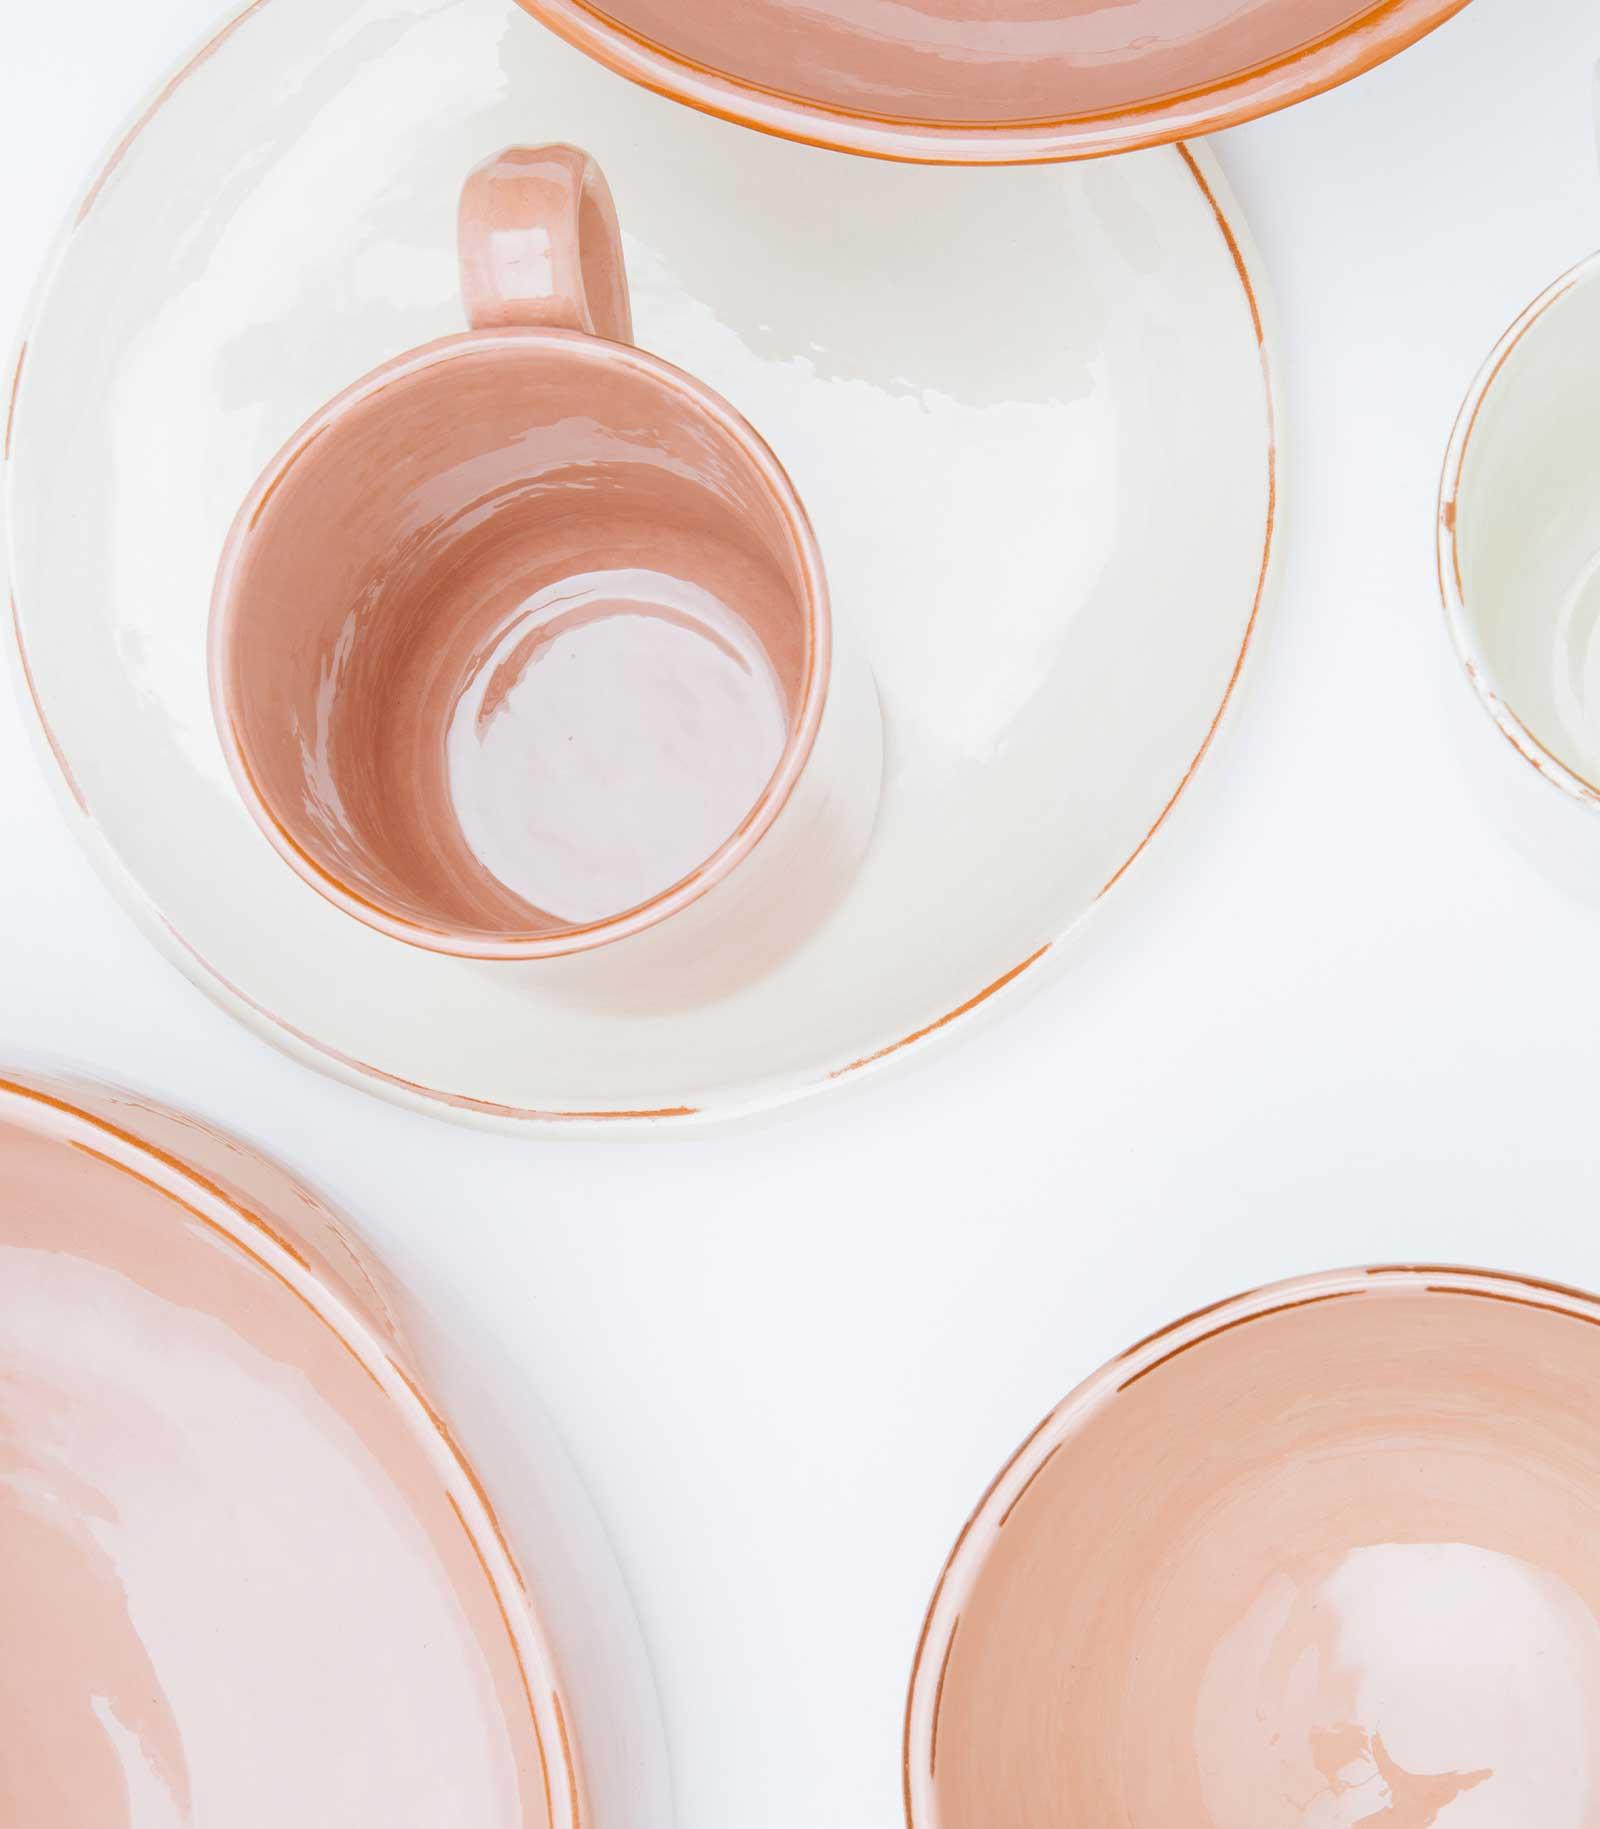 Form Ceramics